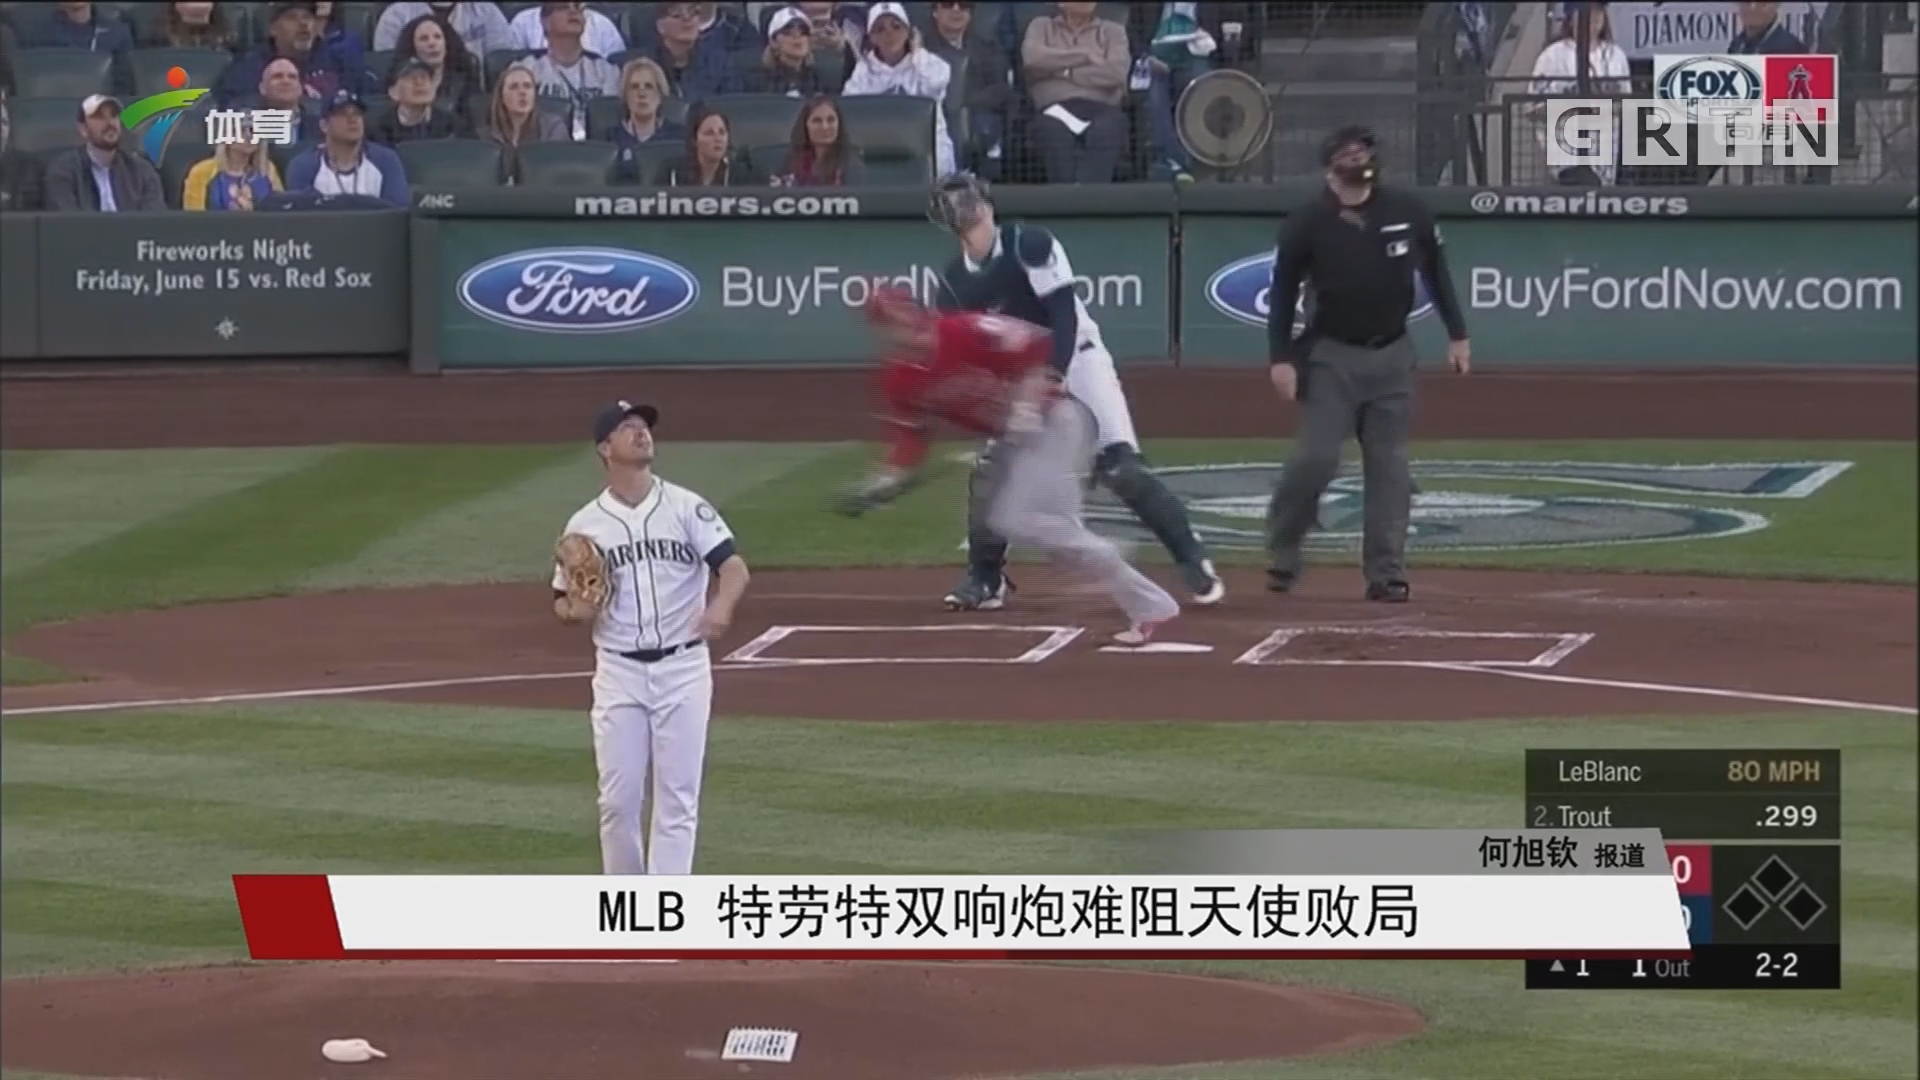 MLB 特劳特双响炮难阻天使败局